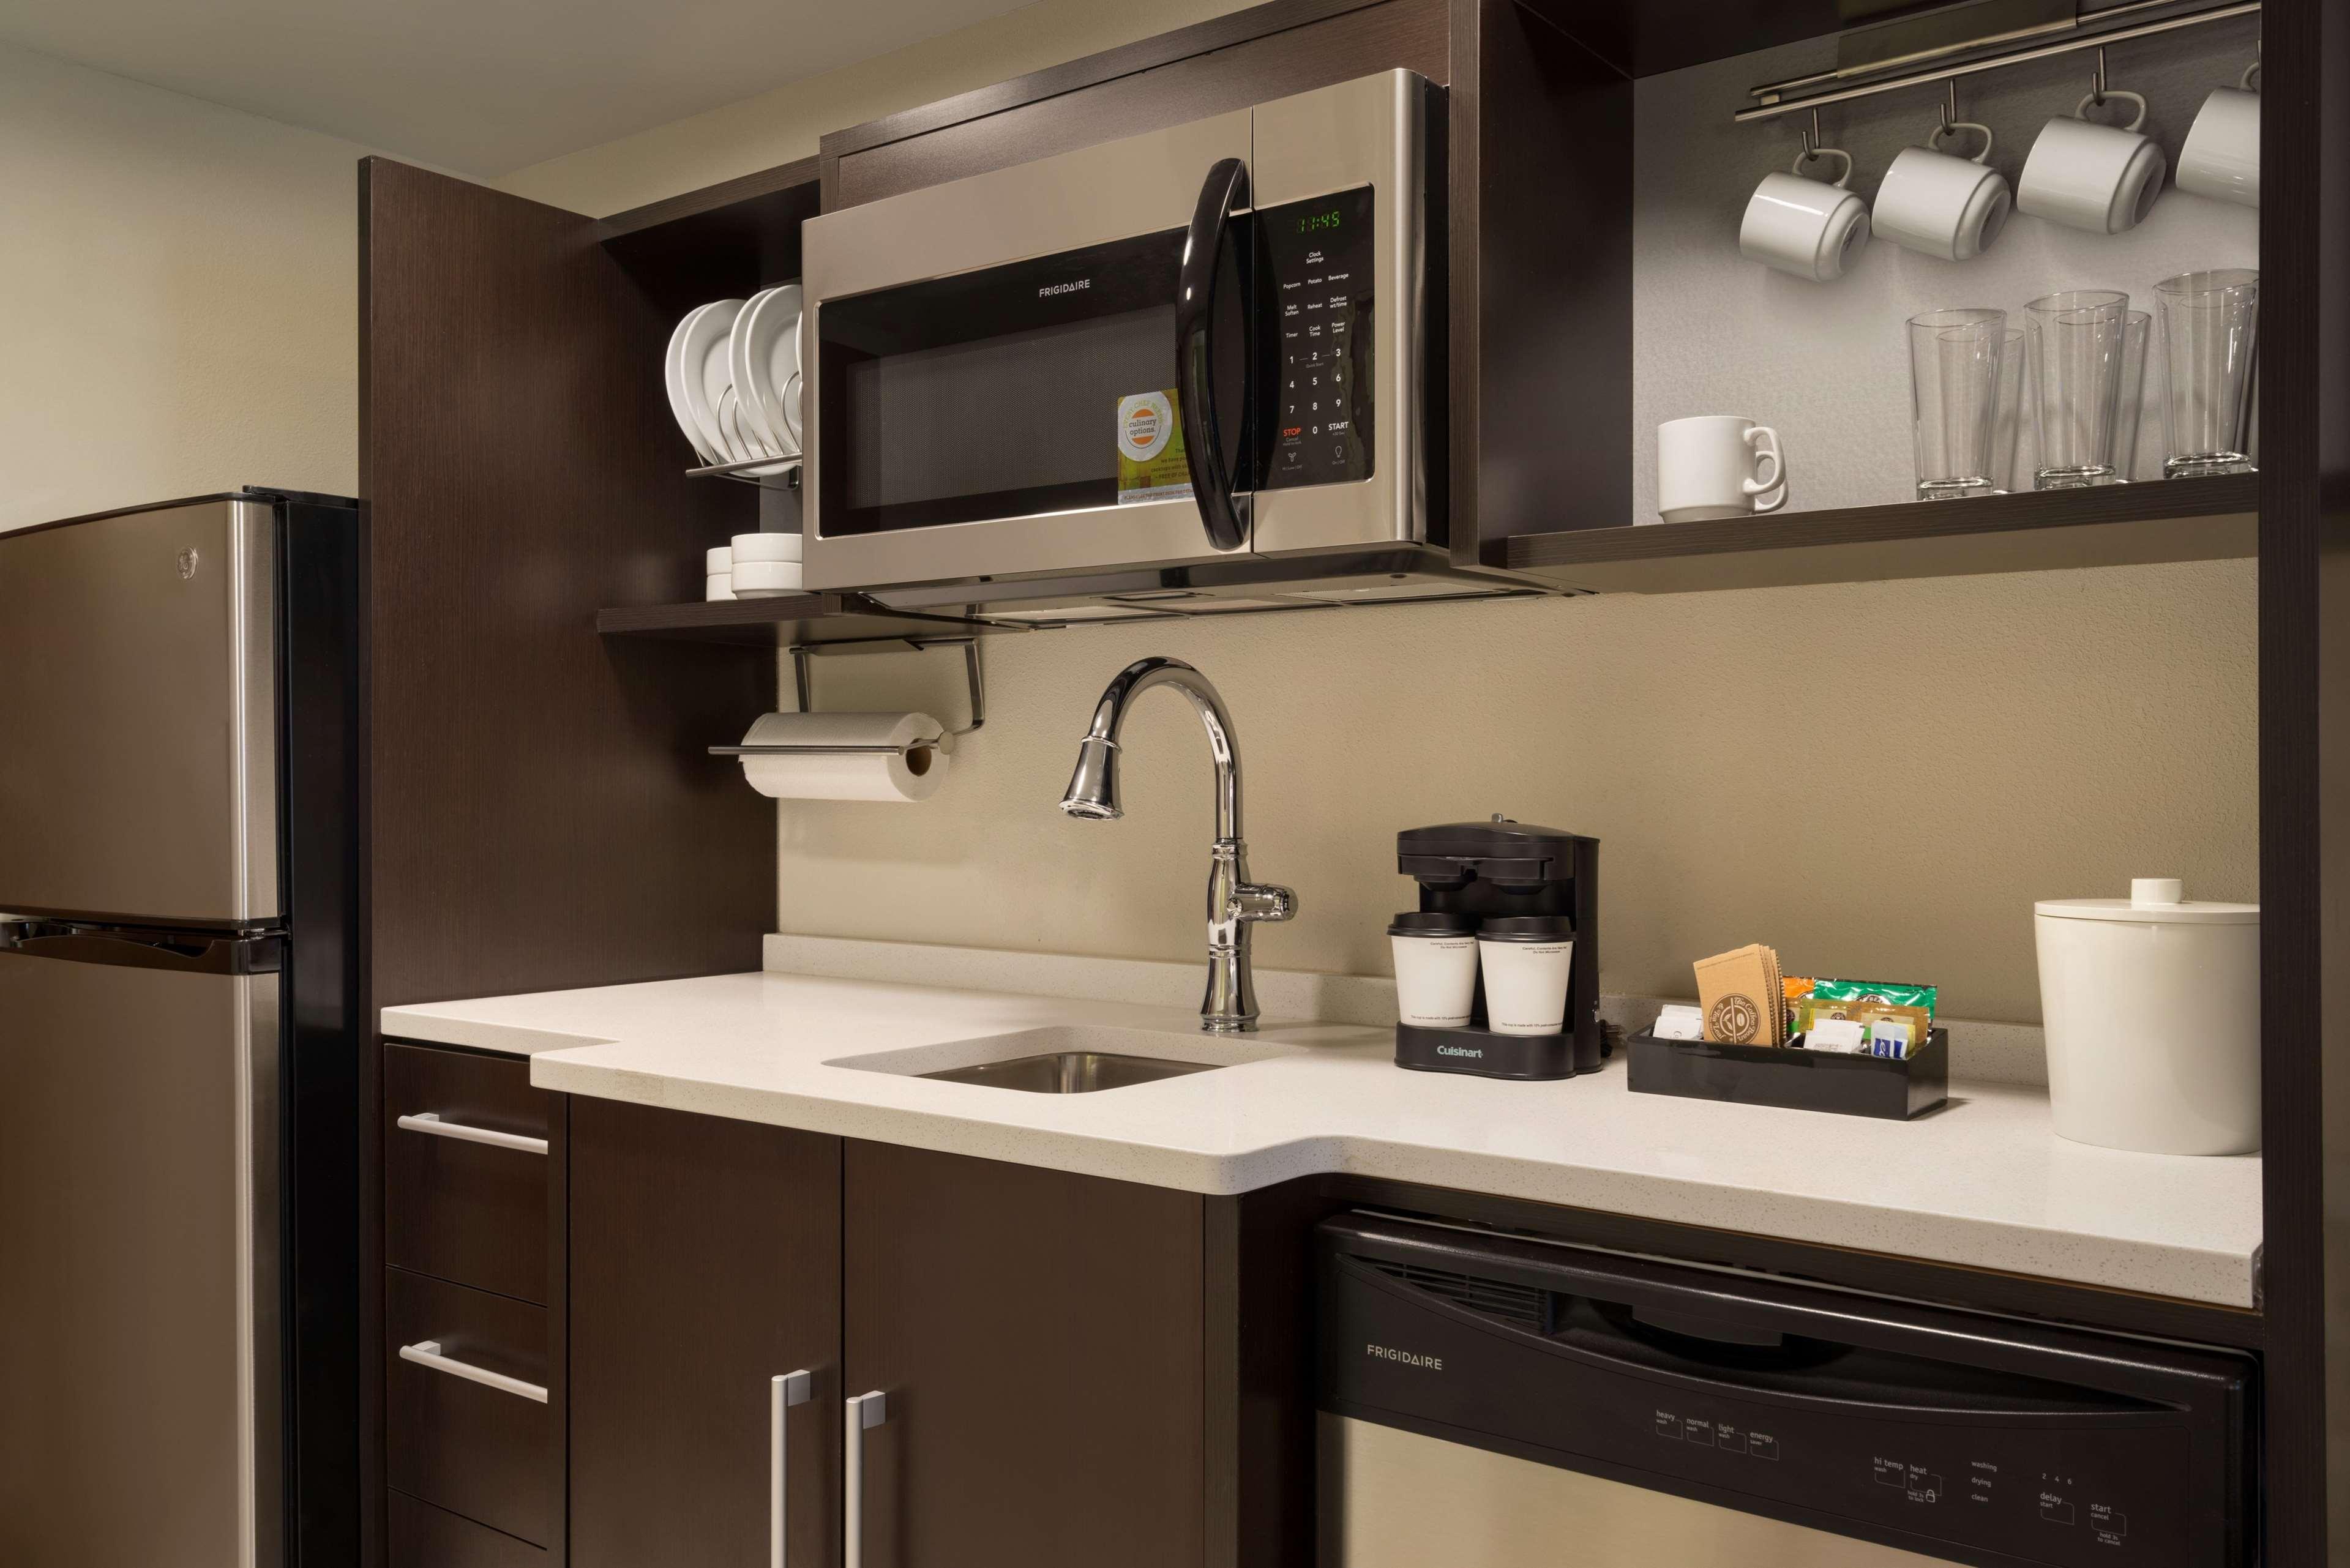 Home2 Suites by Hilton Leavenworth Downtown image 28